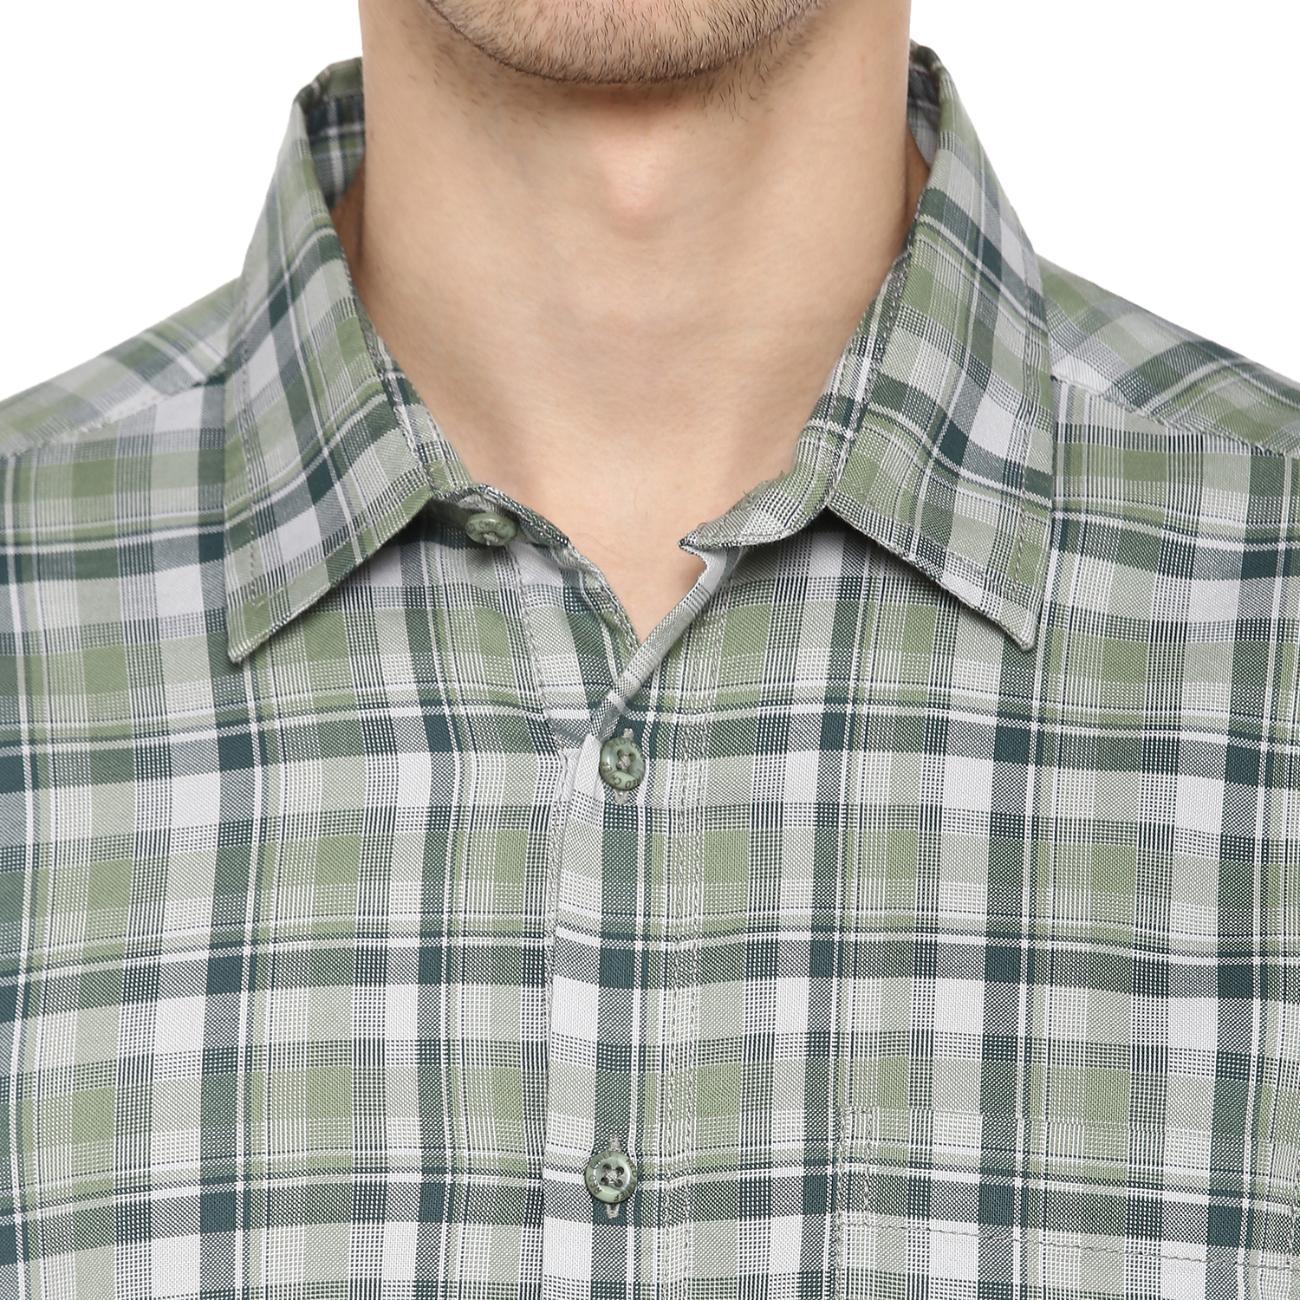 Printed Shirts for Men